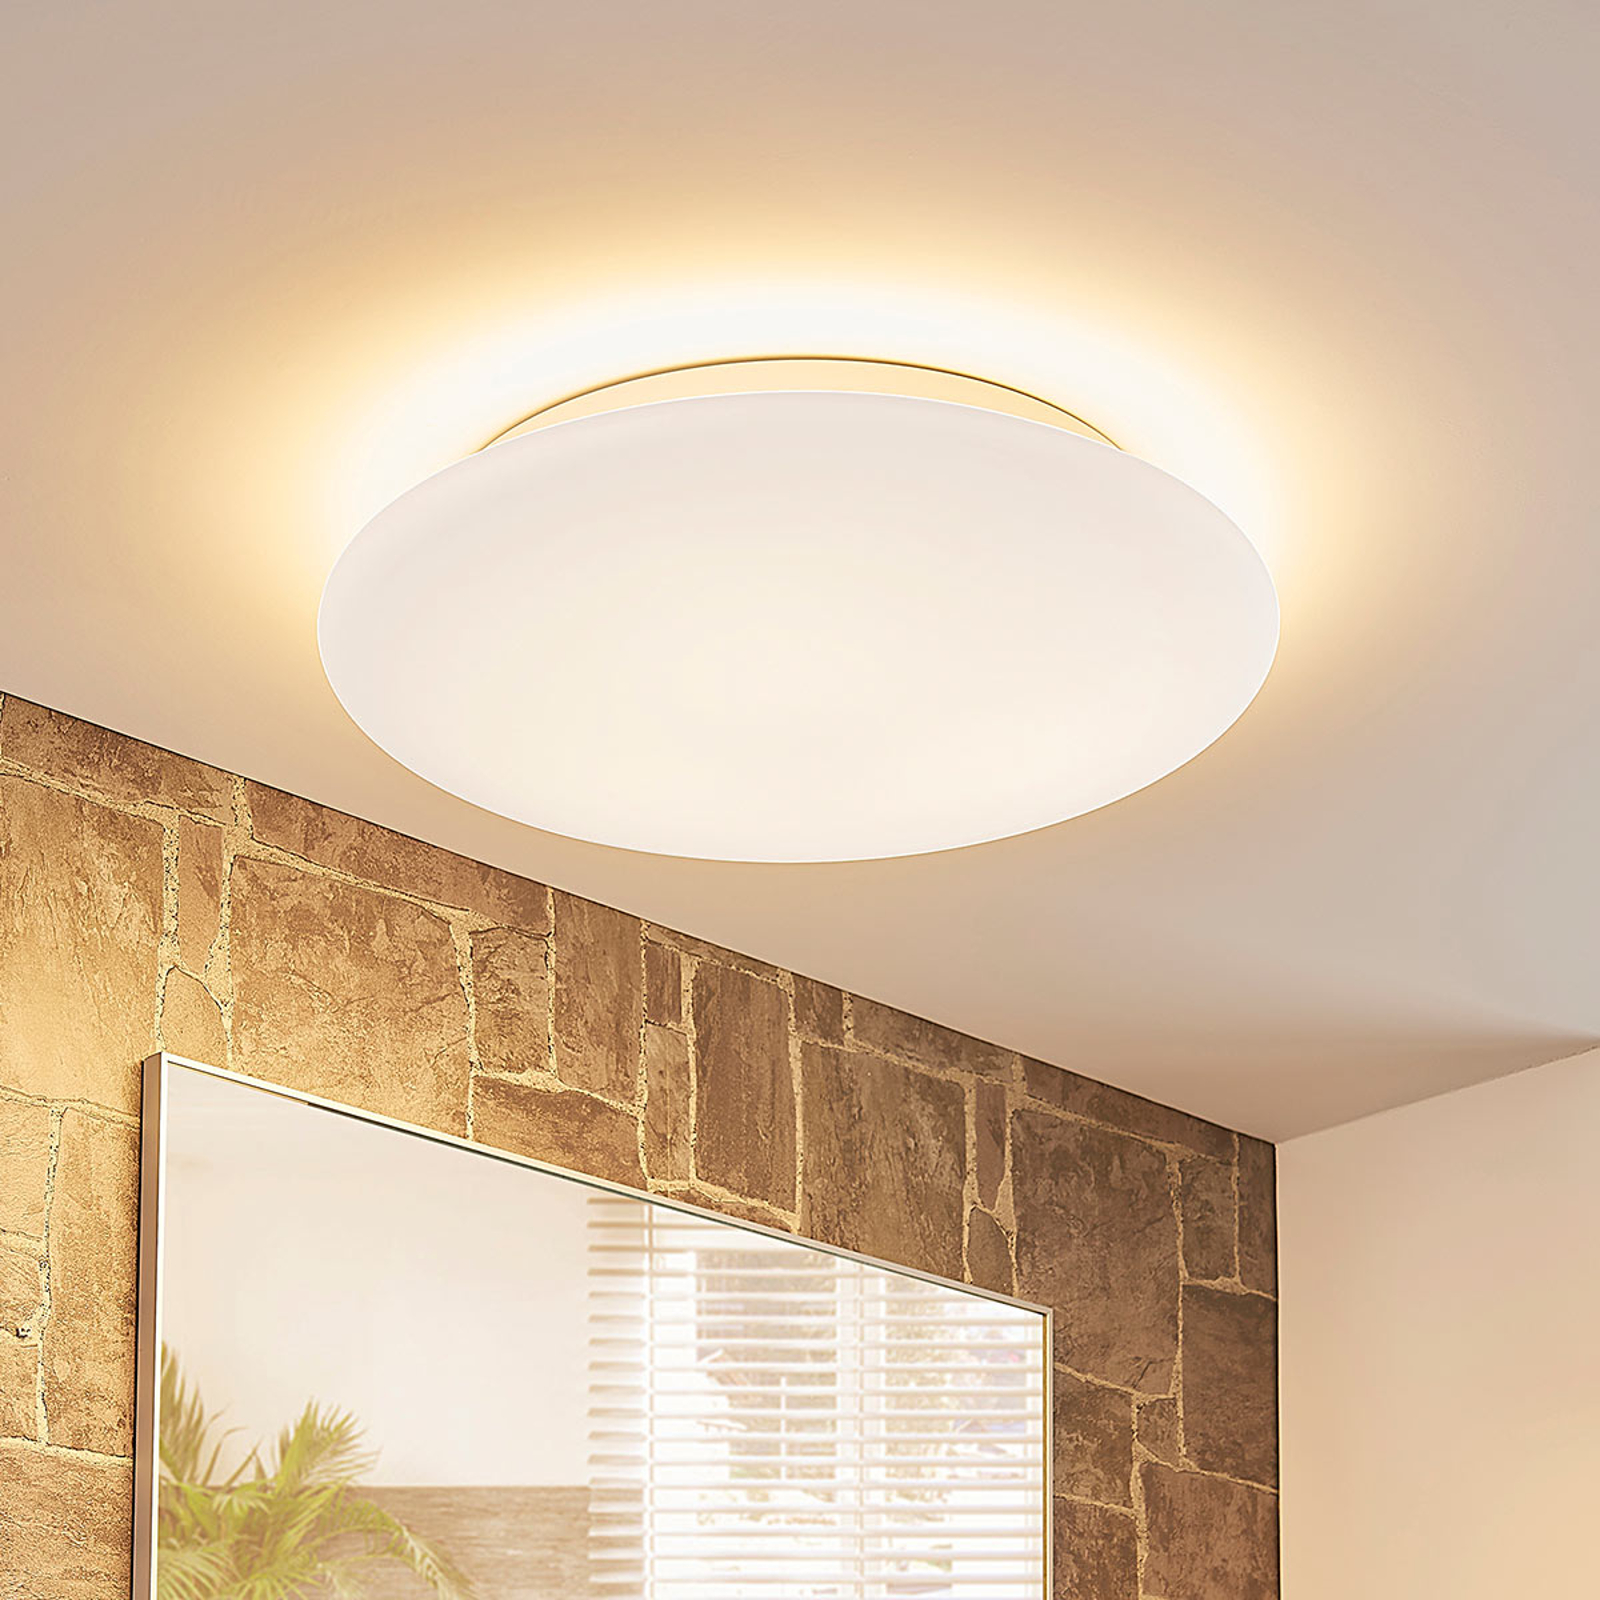 Ściemniana lampa sufitowa LED Toan, IP44